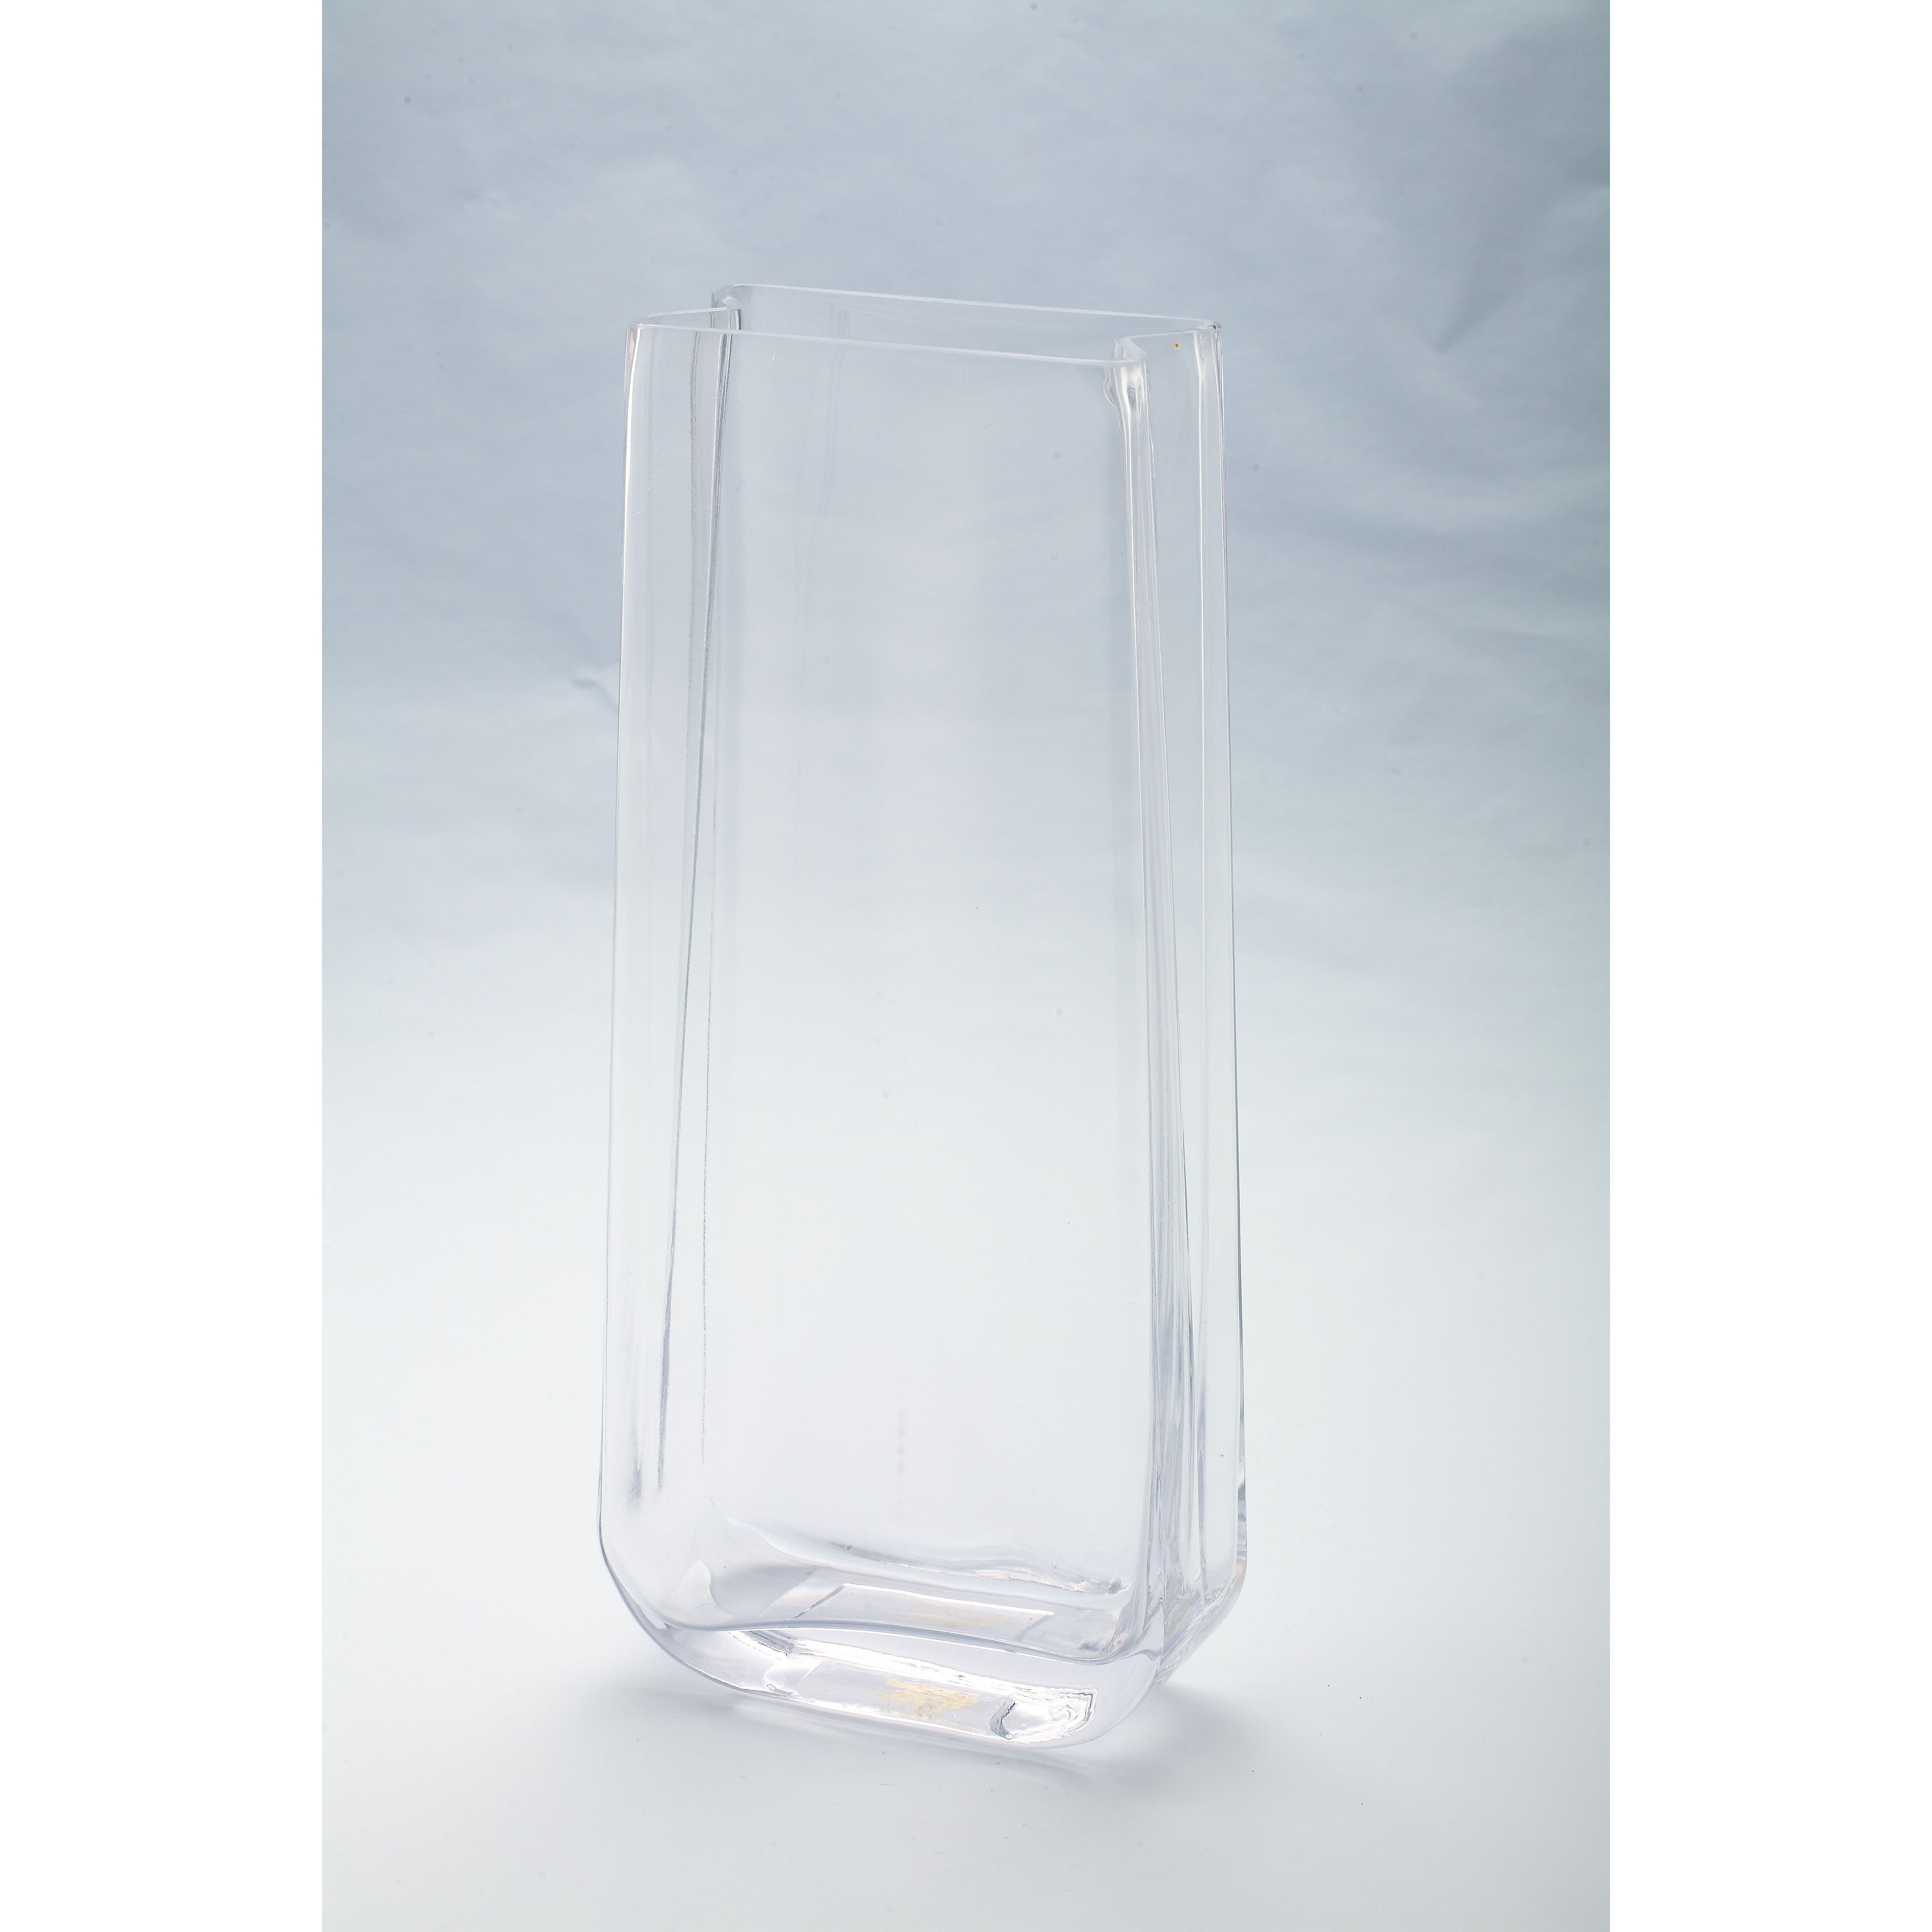 18 cylinder vase of diamond star glass vase wedding rental ideas pinterest wedding intended for vase diamond star glass vase